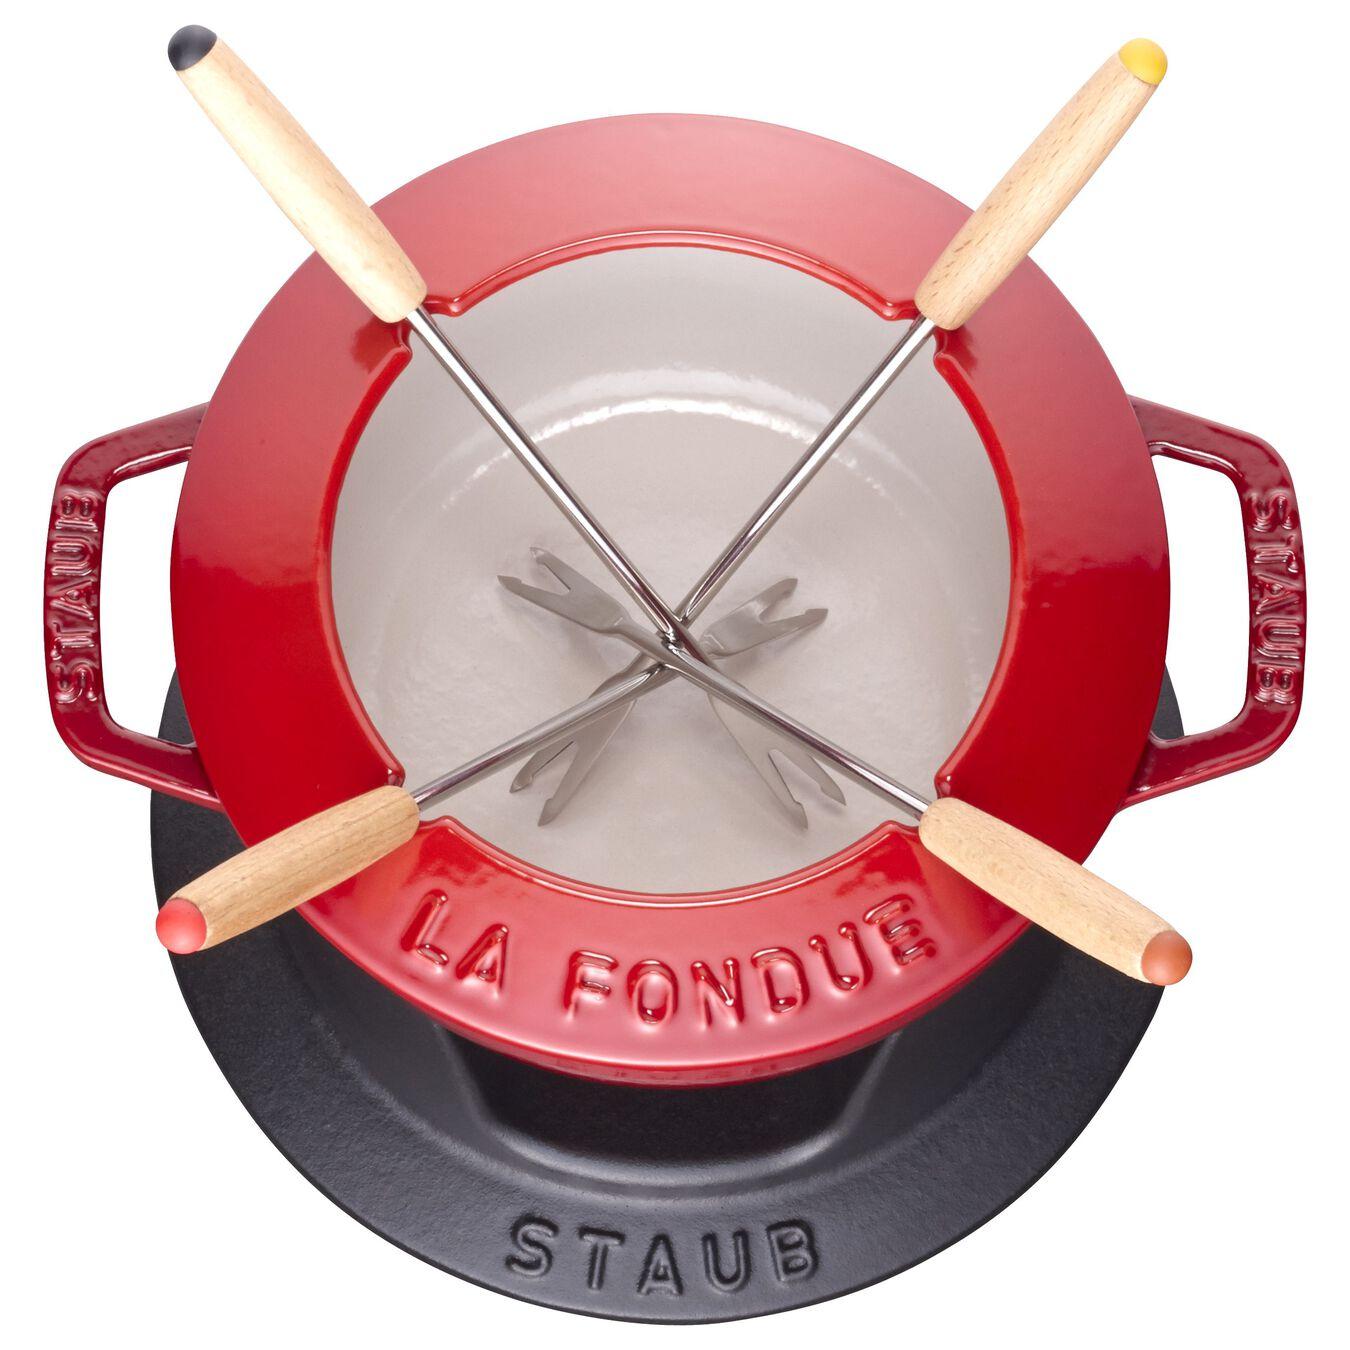 Service à fondue 16 cm, Cerise, Fonte,,large 2